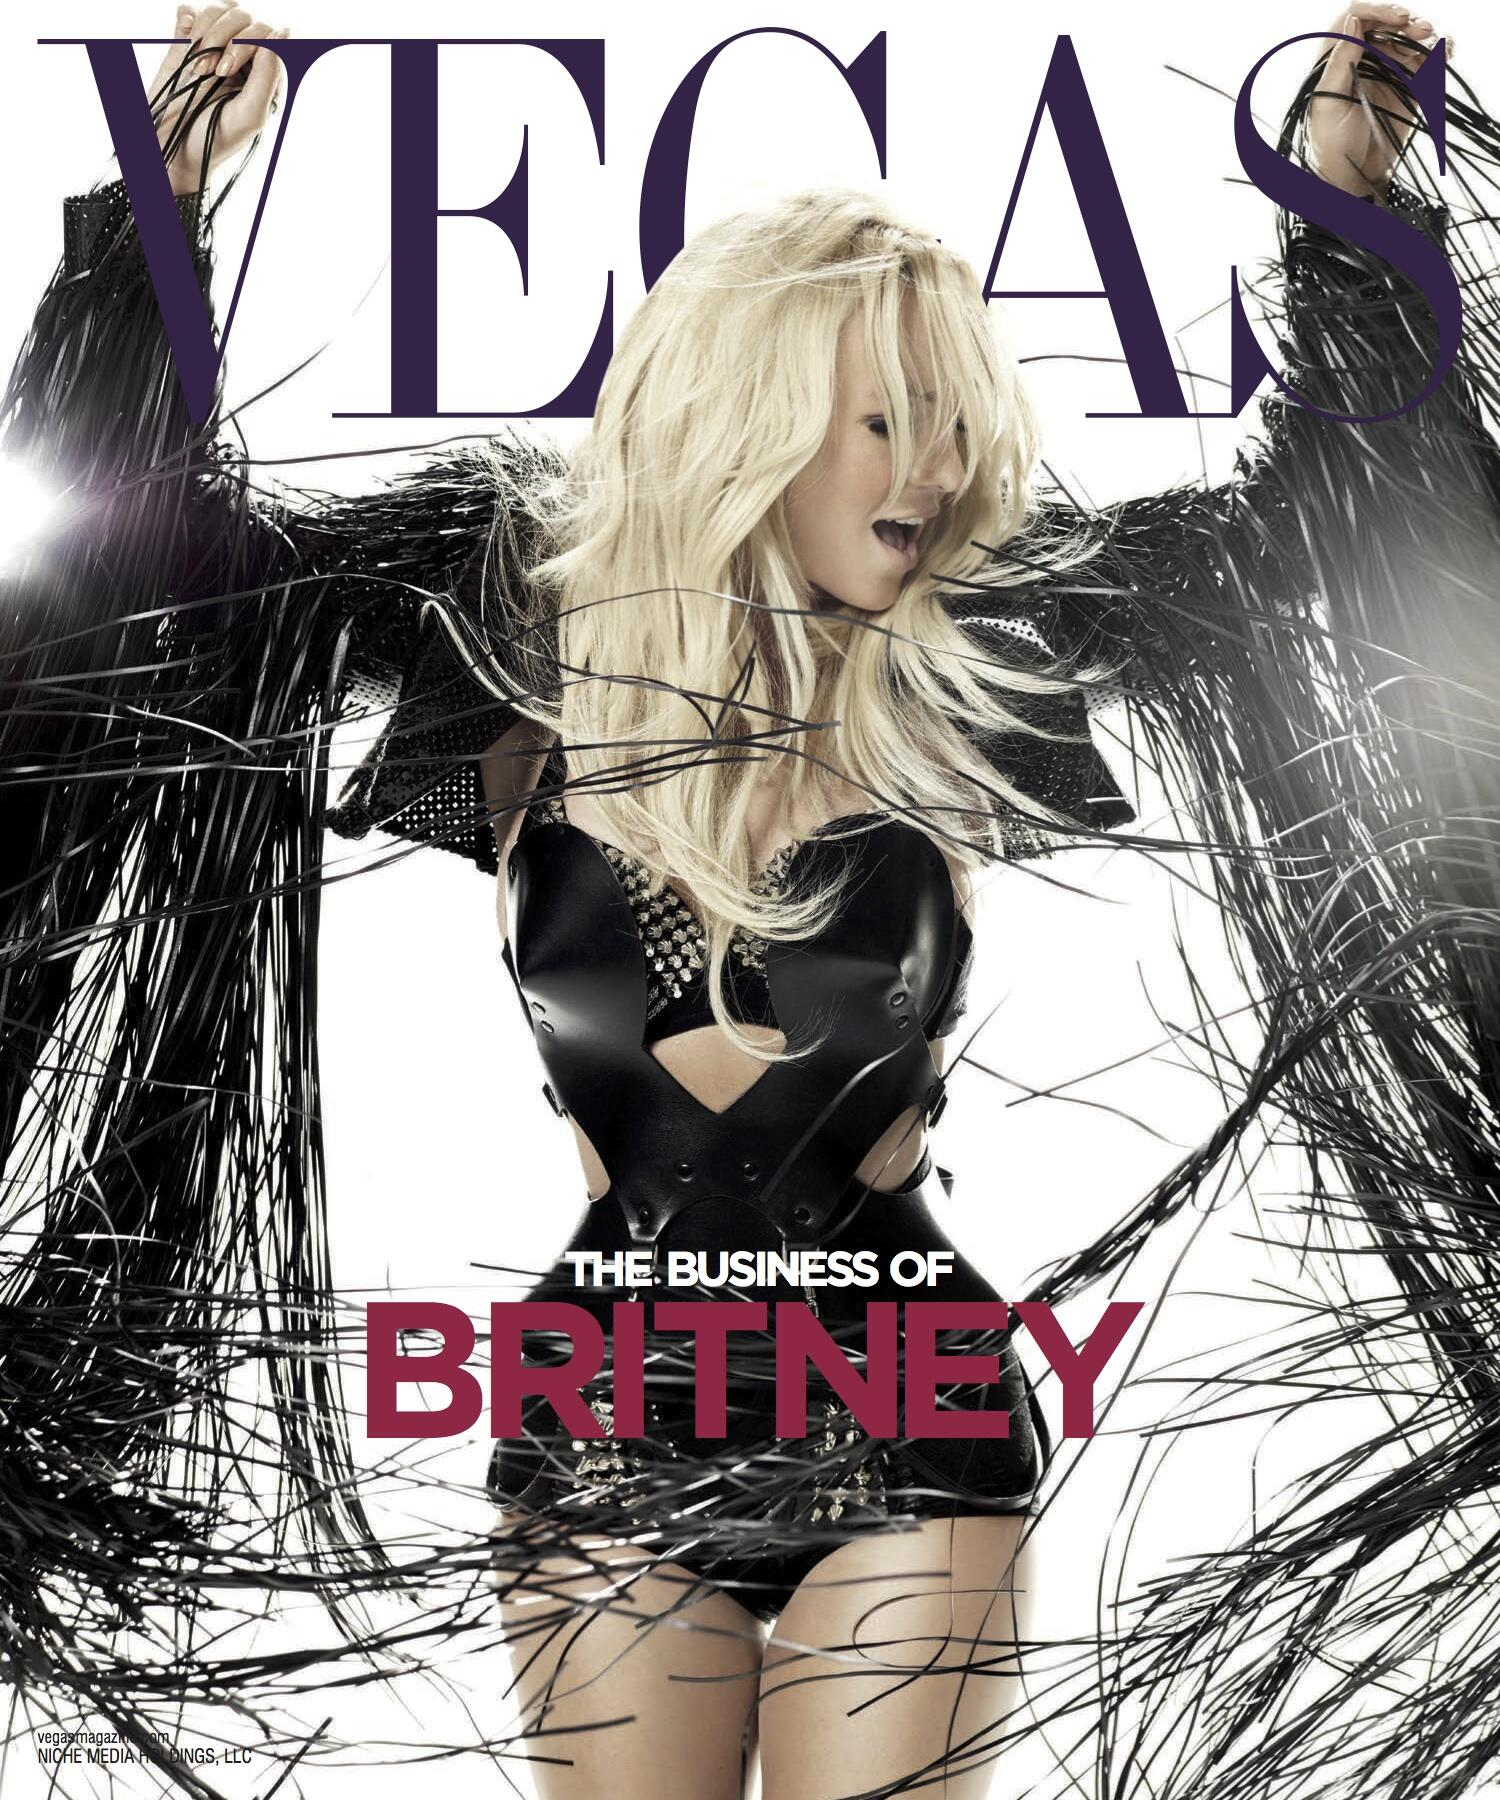 Twitter / britneyspears: .@VegasMagazine Winter 2014 ...